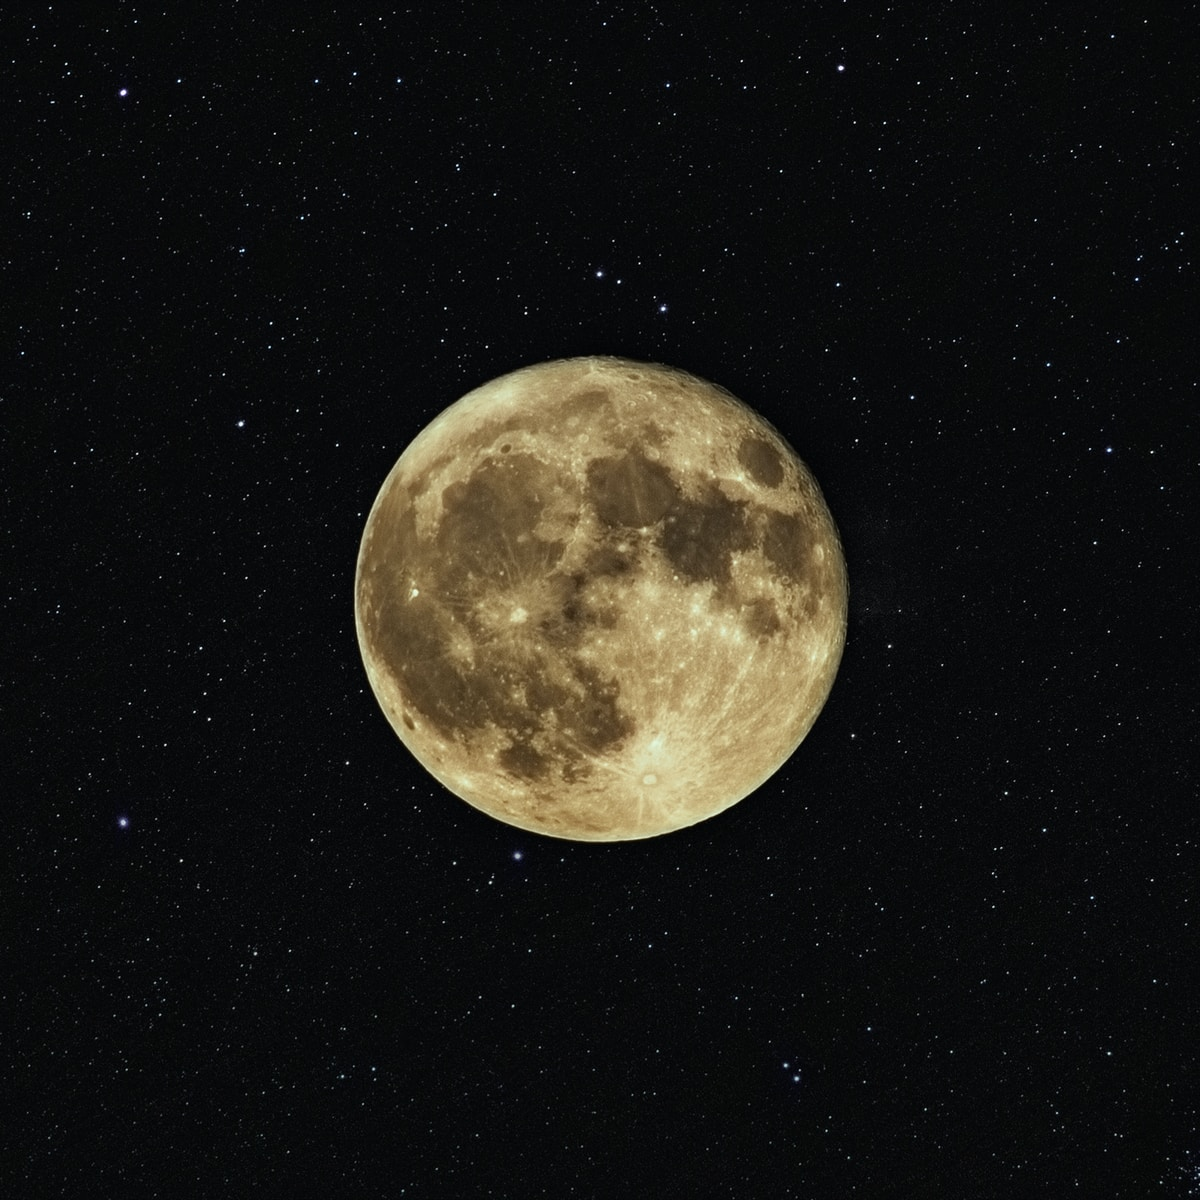 viaje a la Luna, close up photography of moon